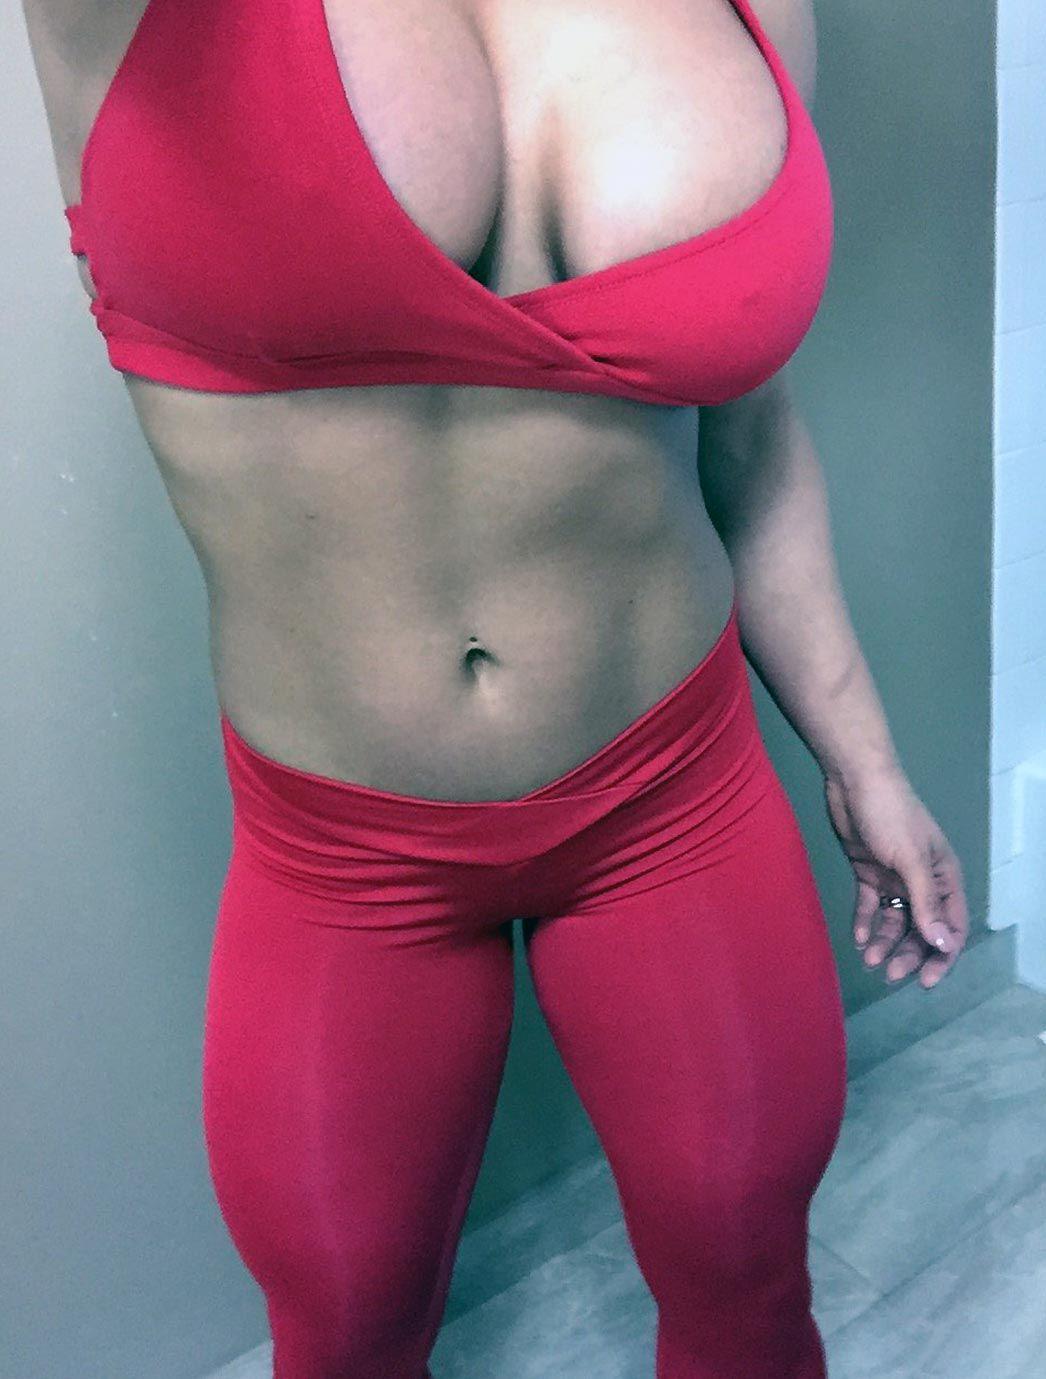 Celeste Bonin Nude Leaked The Fappening & Sexy 0246